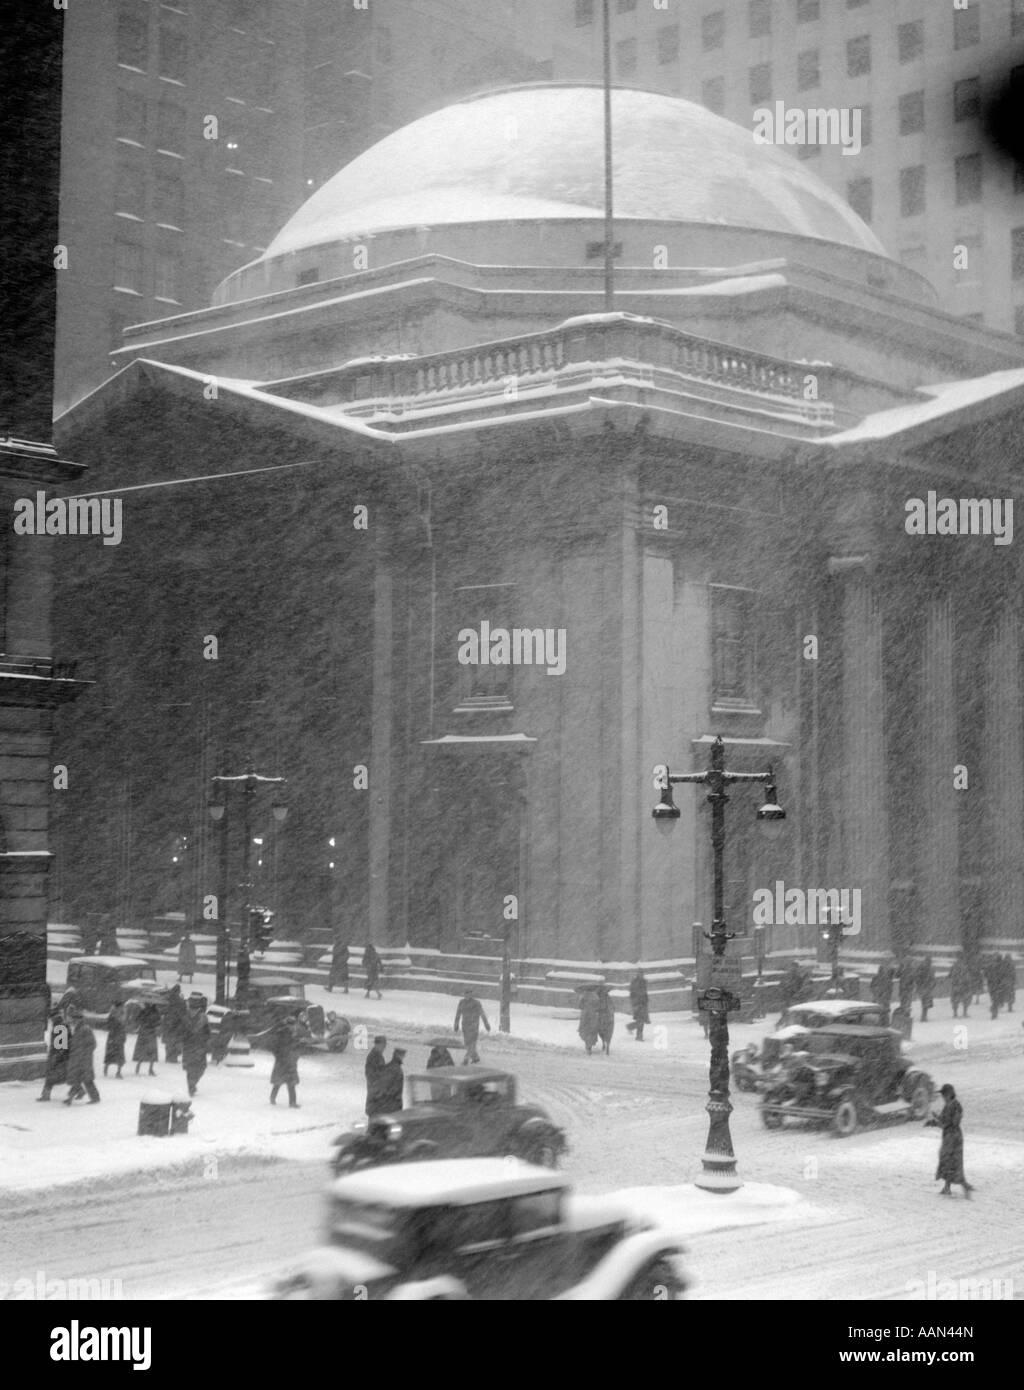 1930s Girard Bank Building Philadelphia Pa Pedestrians